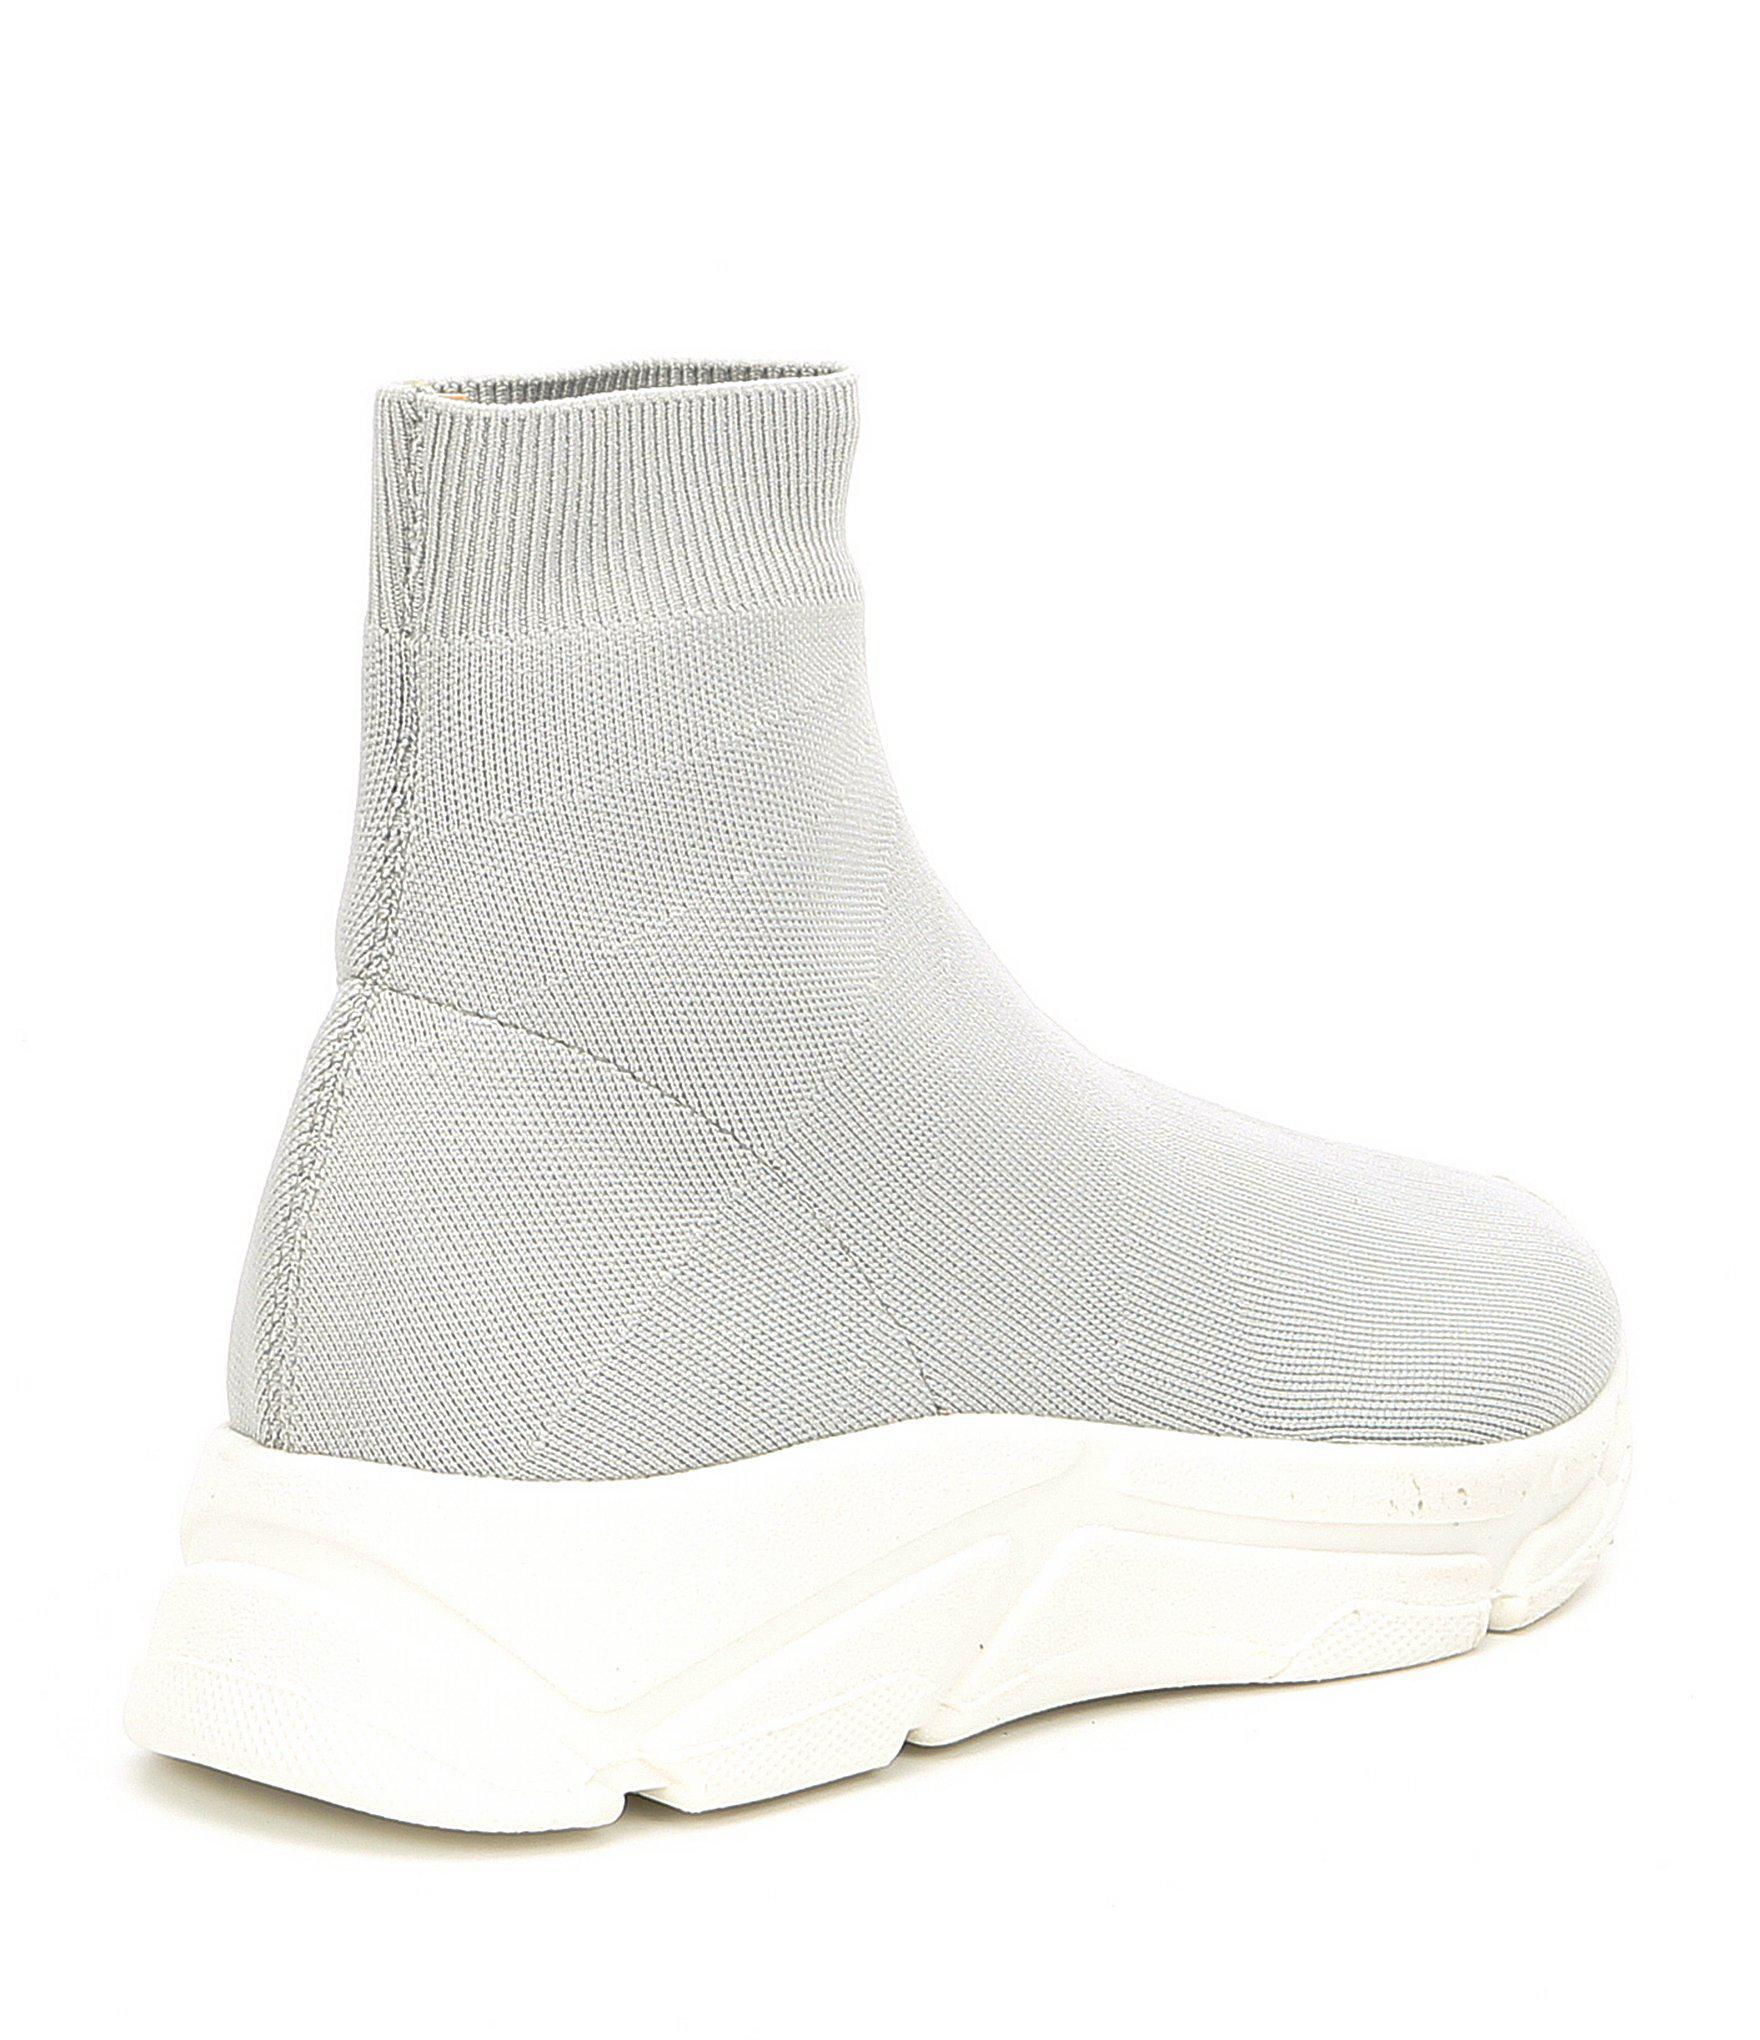 ff88265e09c Steve Madden Gray Bitten Knit Sneakers